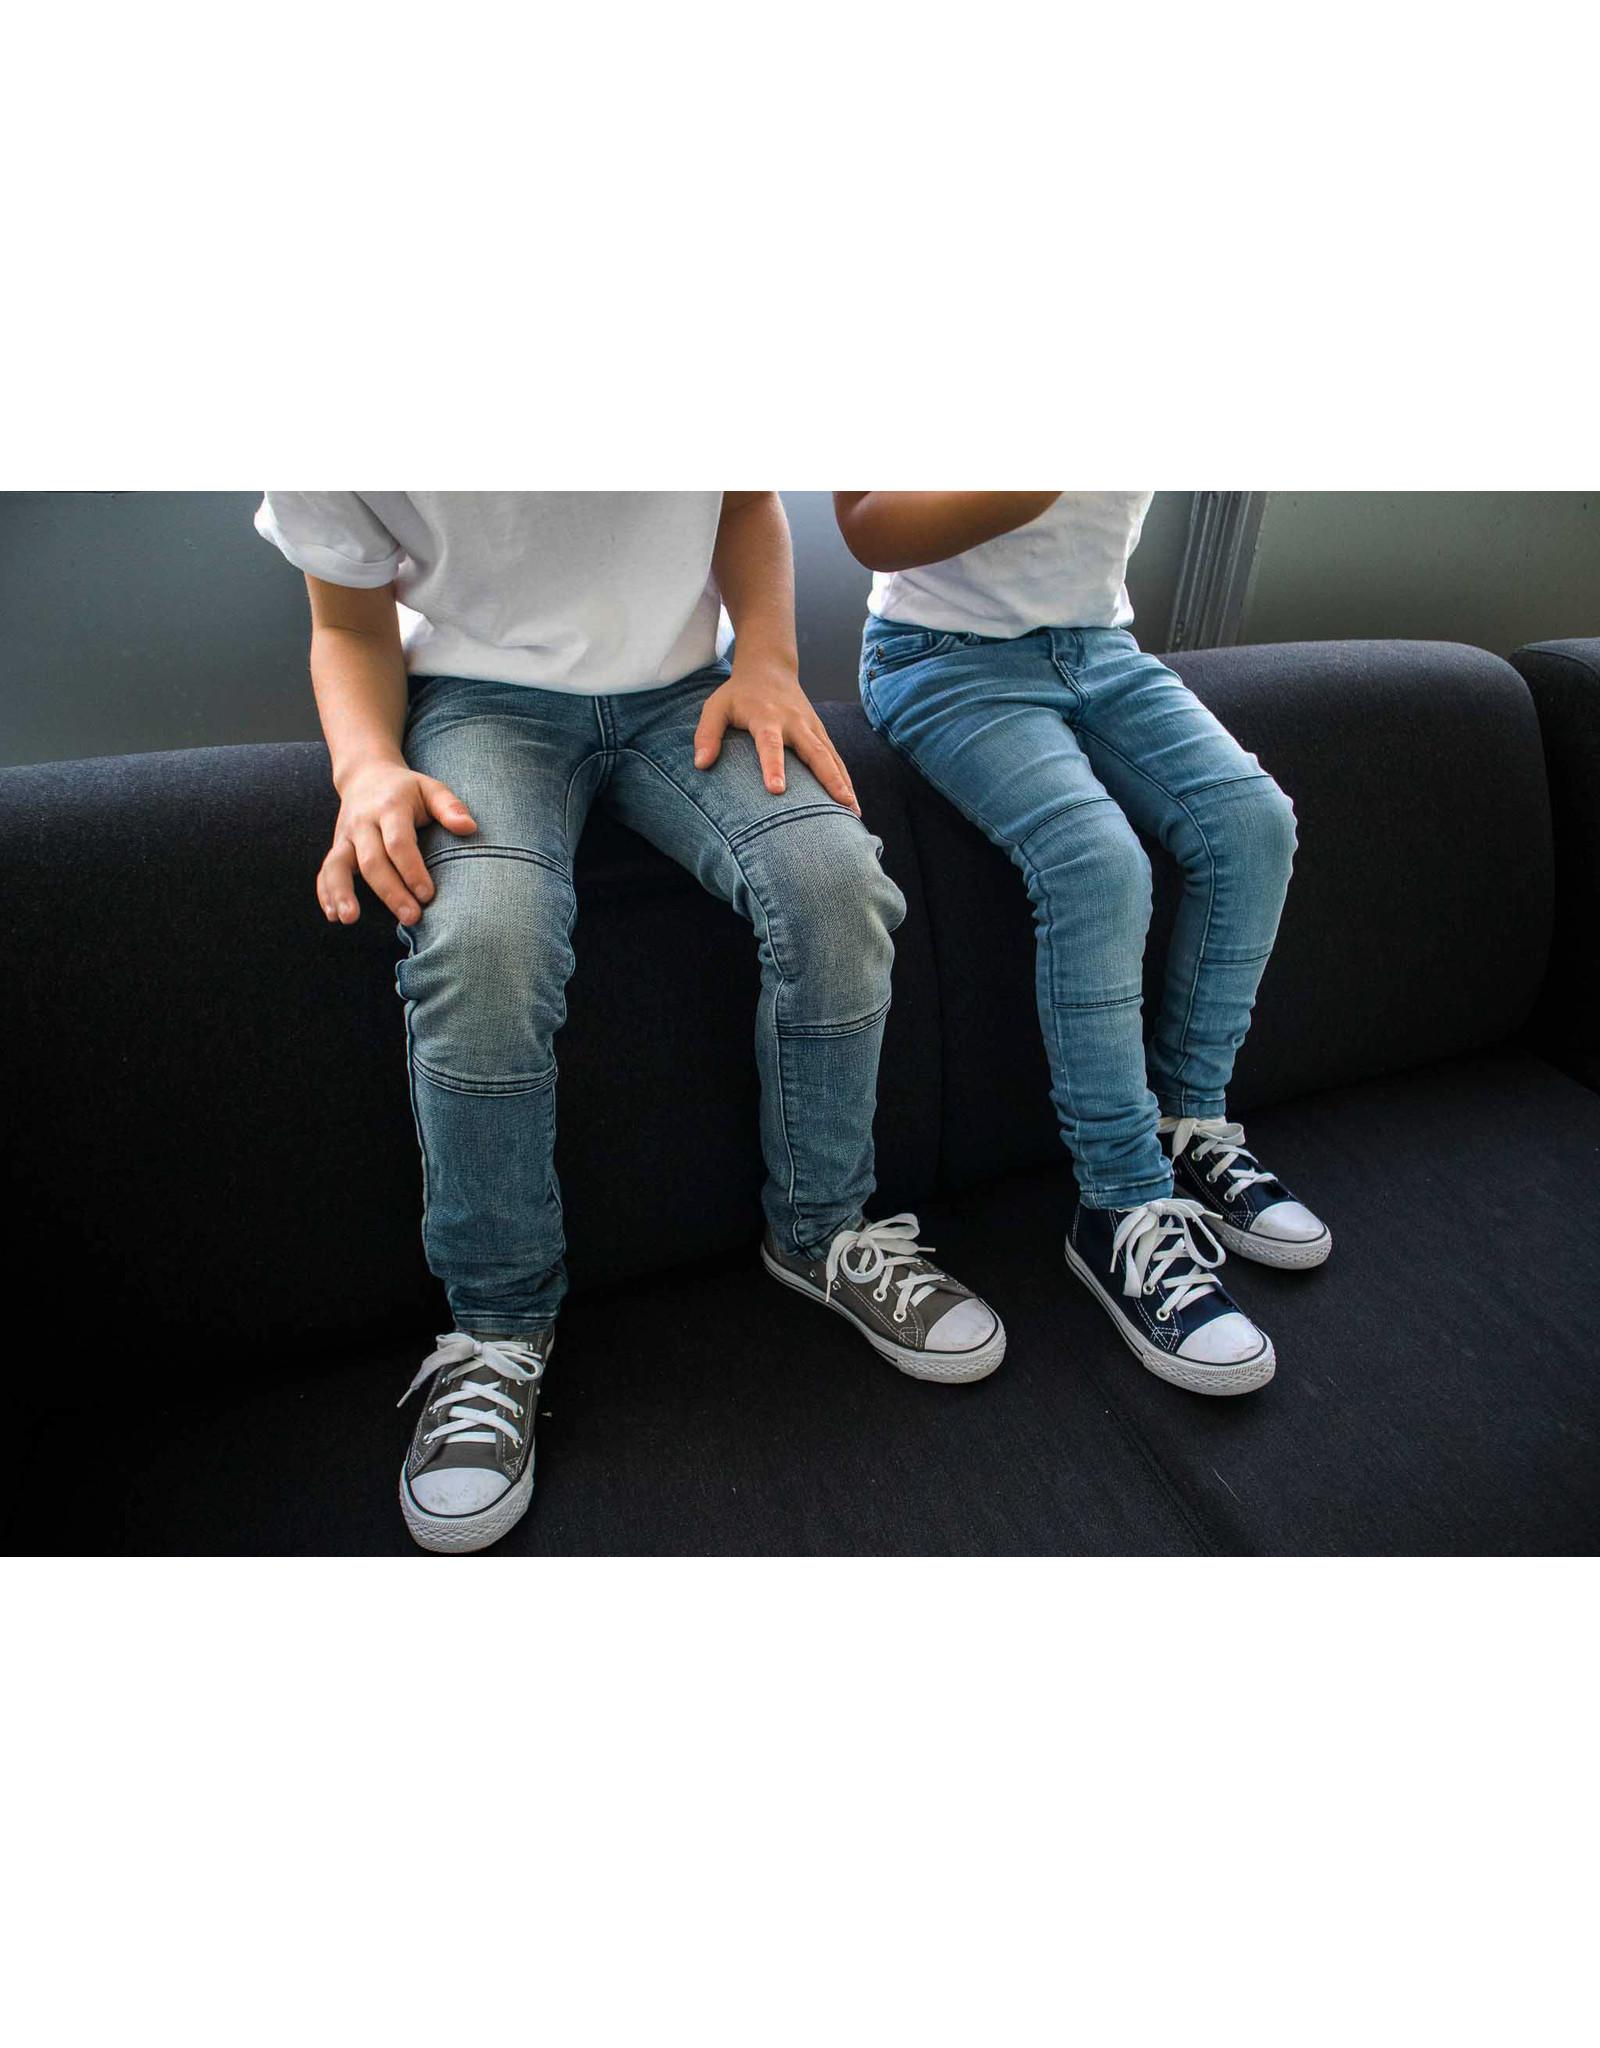 Dutch dream denim FIGO, EXTRA SLIM FIT Jogg jeans met dubbele laag stof op de knieën